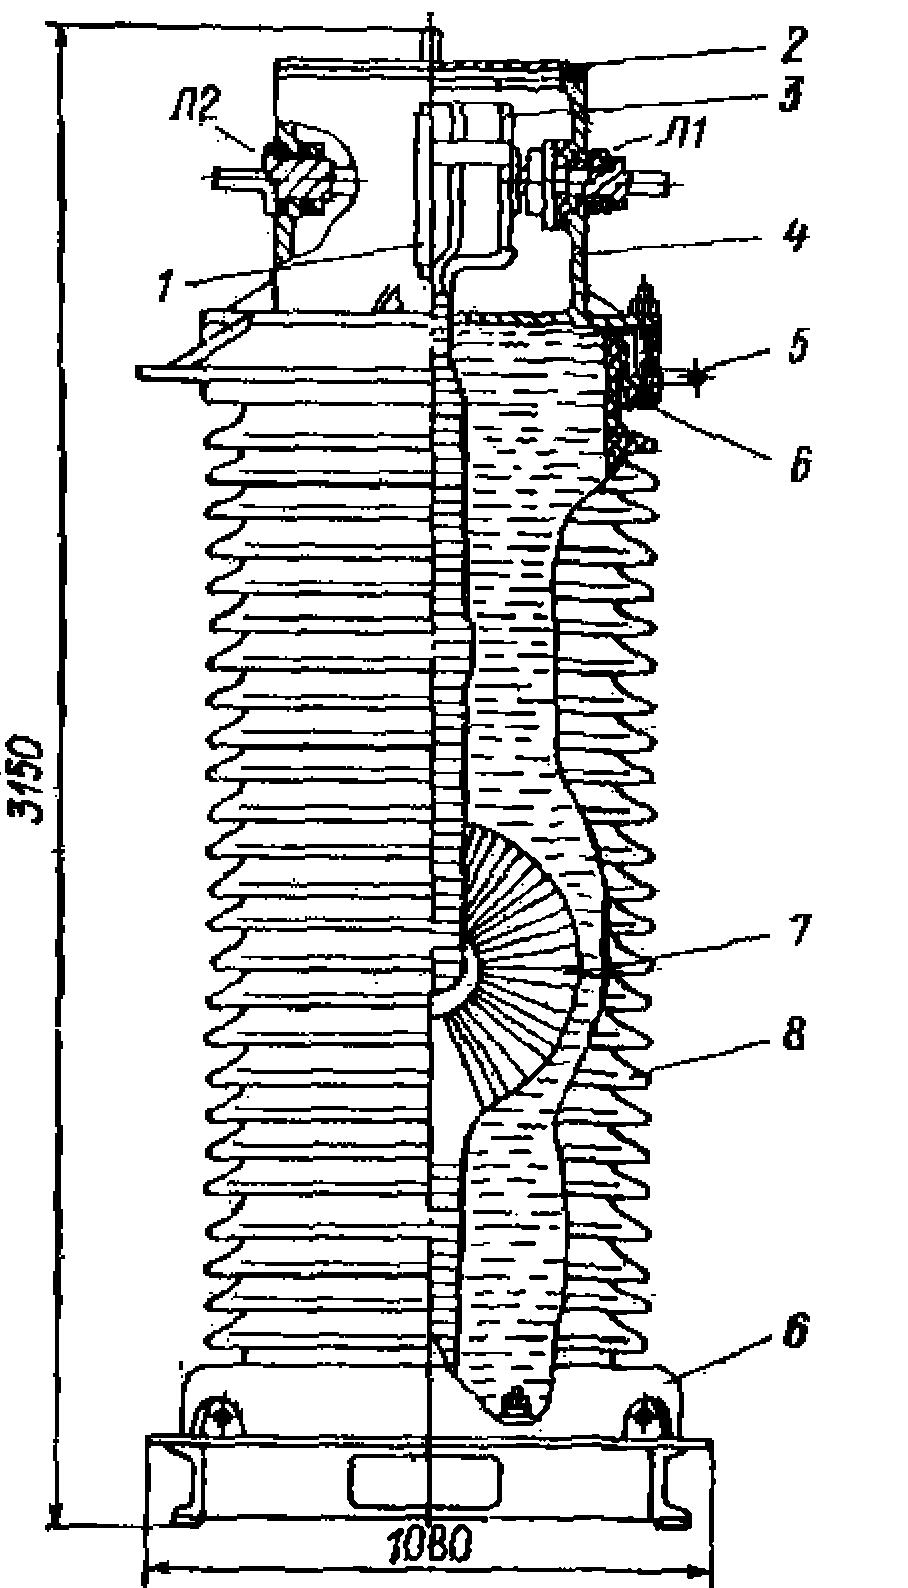 Конструкция трансформатора ТФЗМ-220 Б-IV (ТФЗМ-245 II-IV)